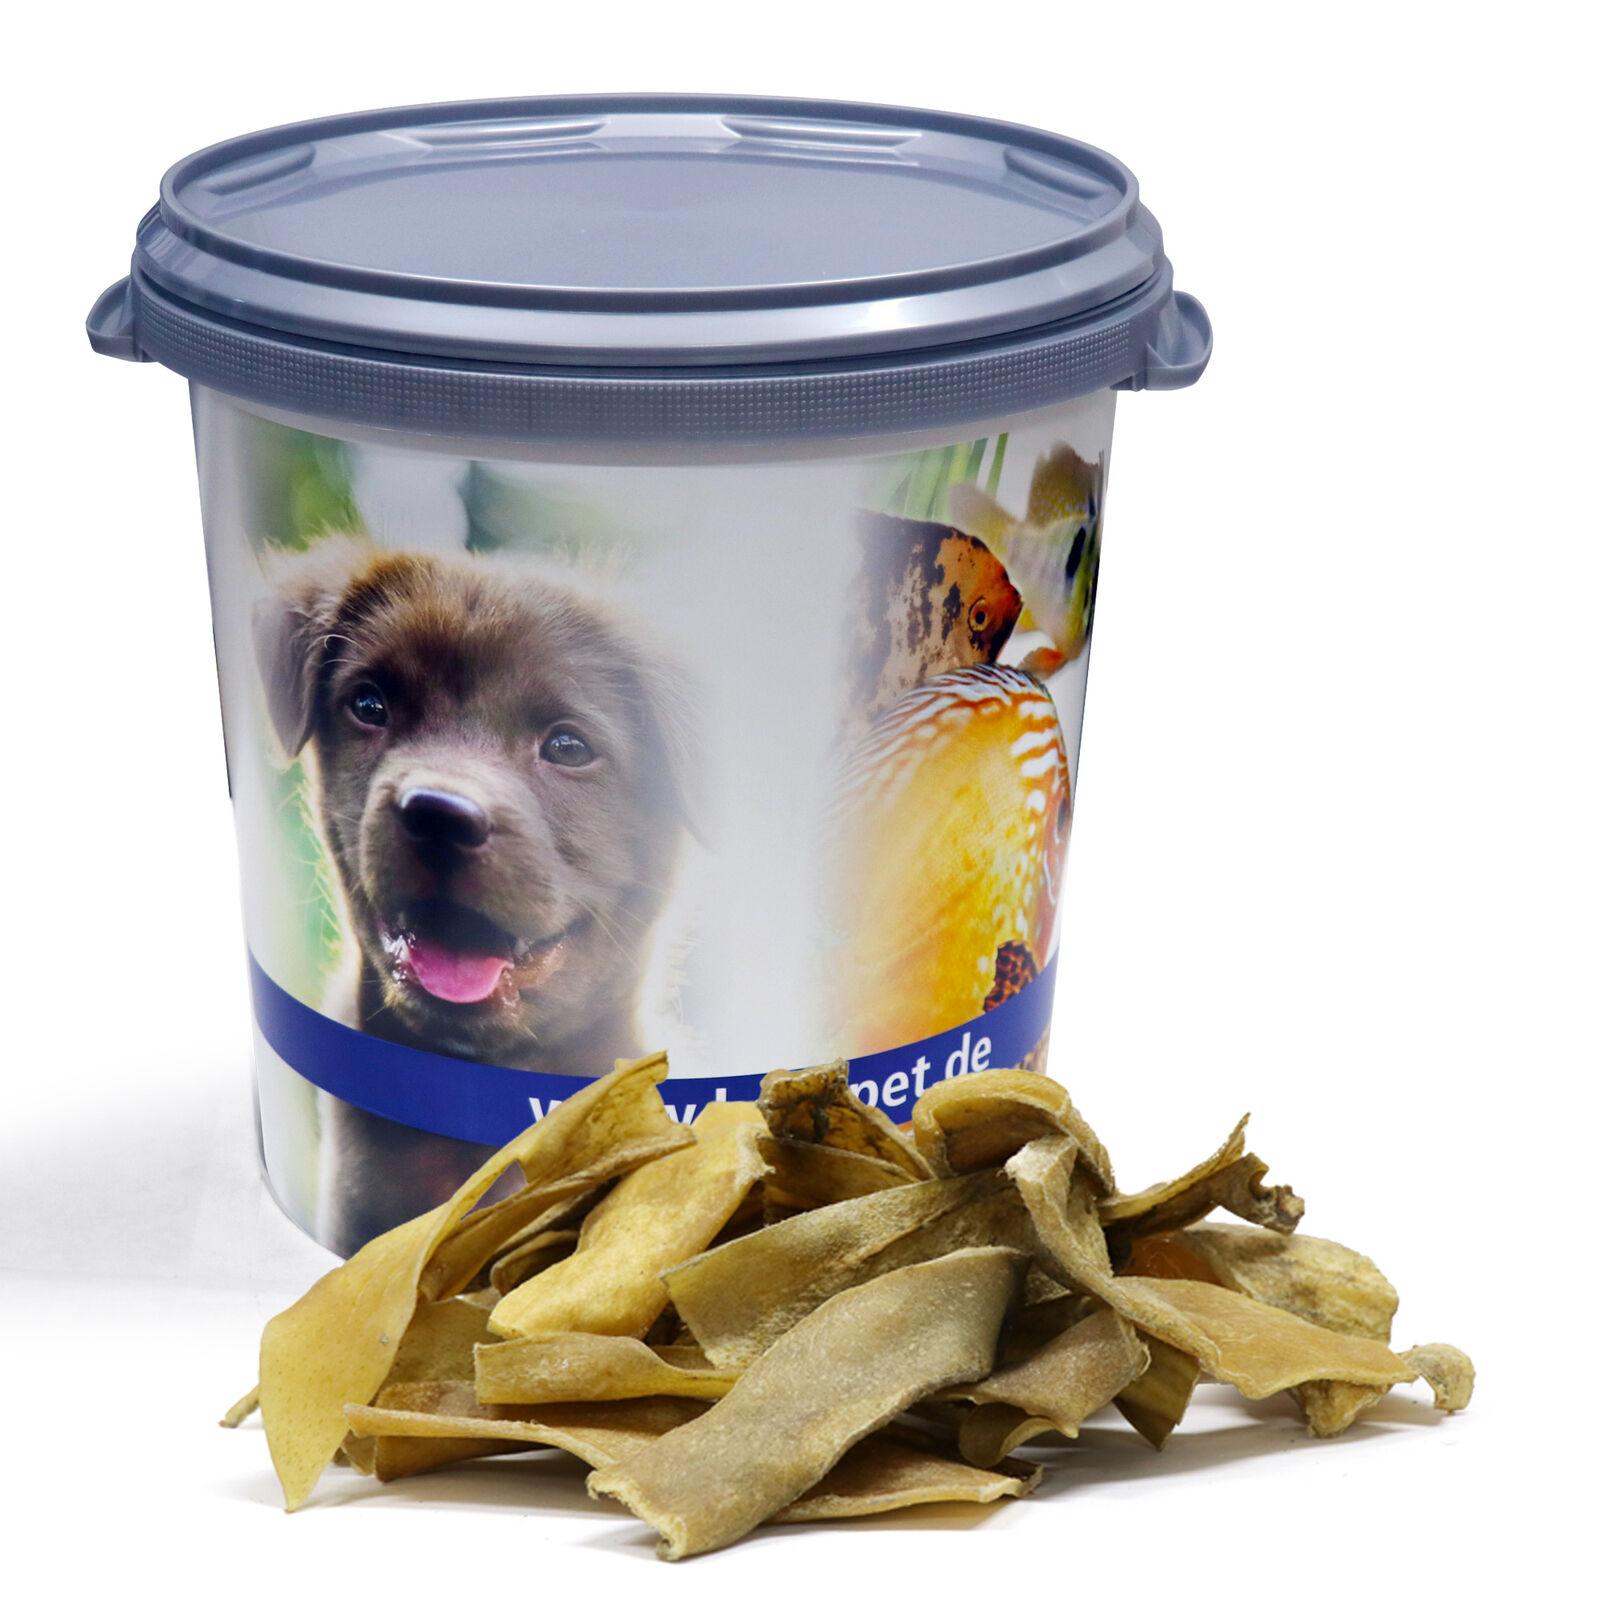 10 kg Rinderkopfhaut goldbraun Kaustreifen Hundefutter Lyra Pet® in 30 L Tonne